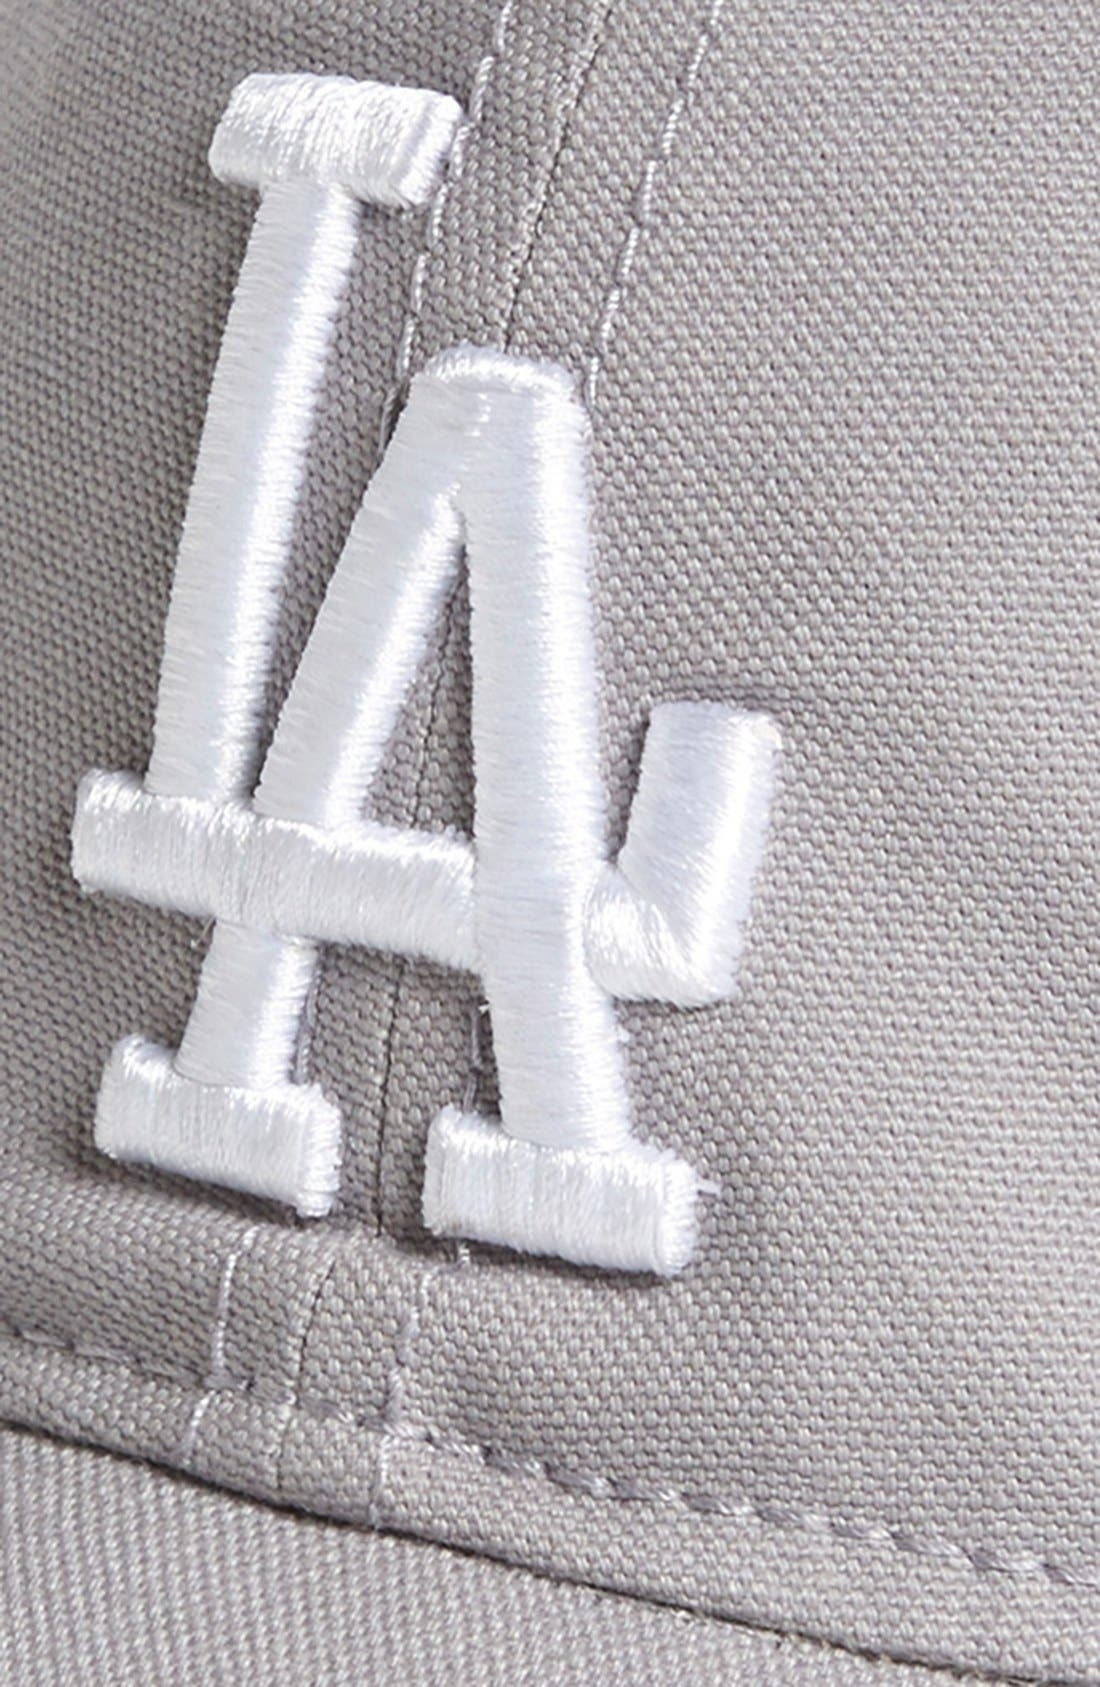 'Core Shore - Los Angeles Dodgers' Baseball Cap,                             Alternate thumbnail 2, color,